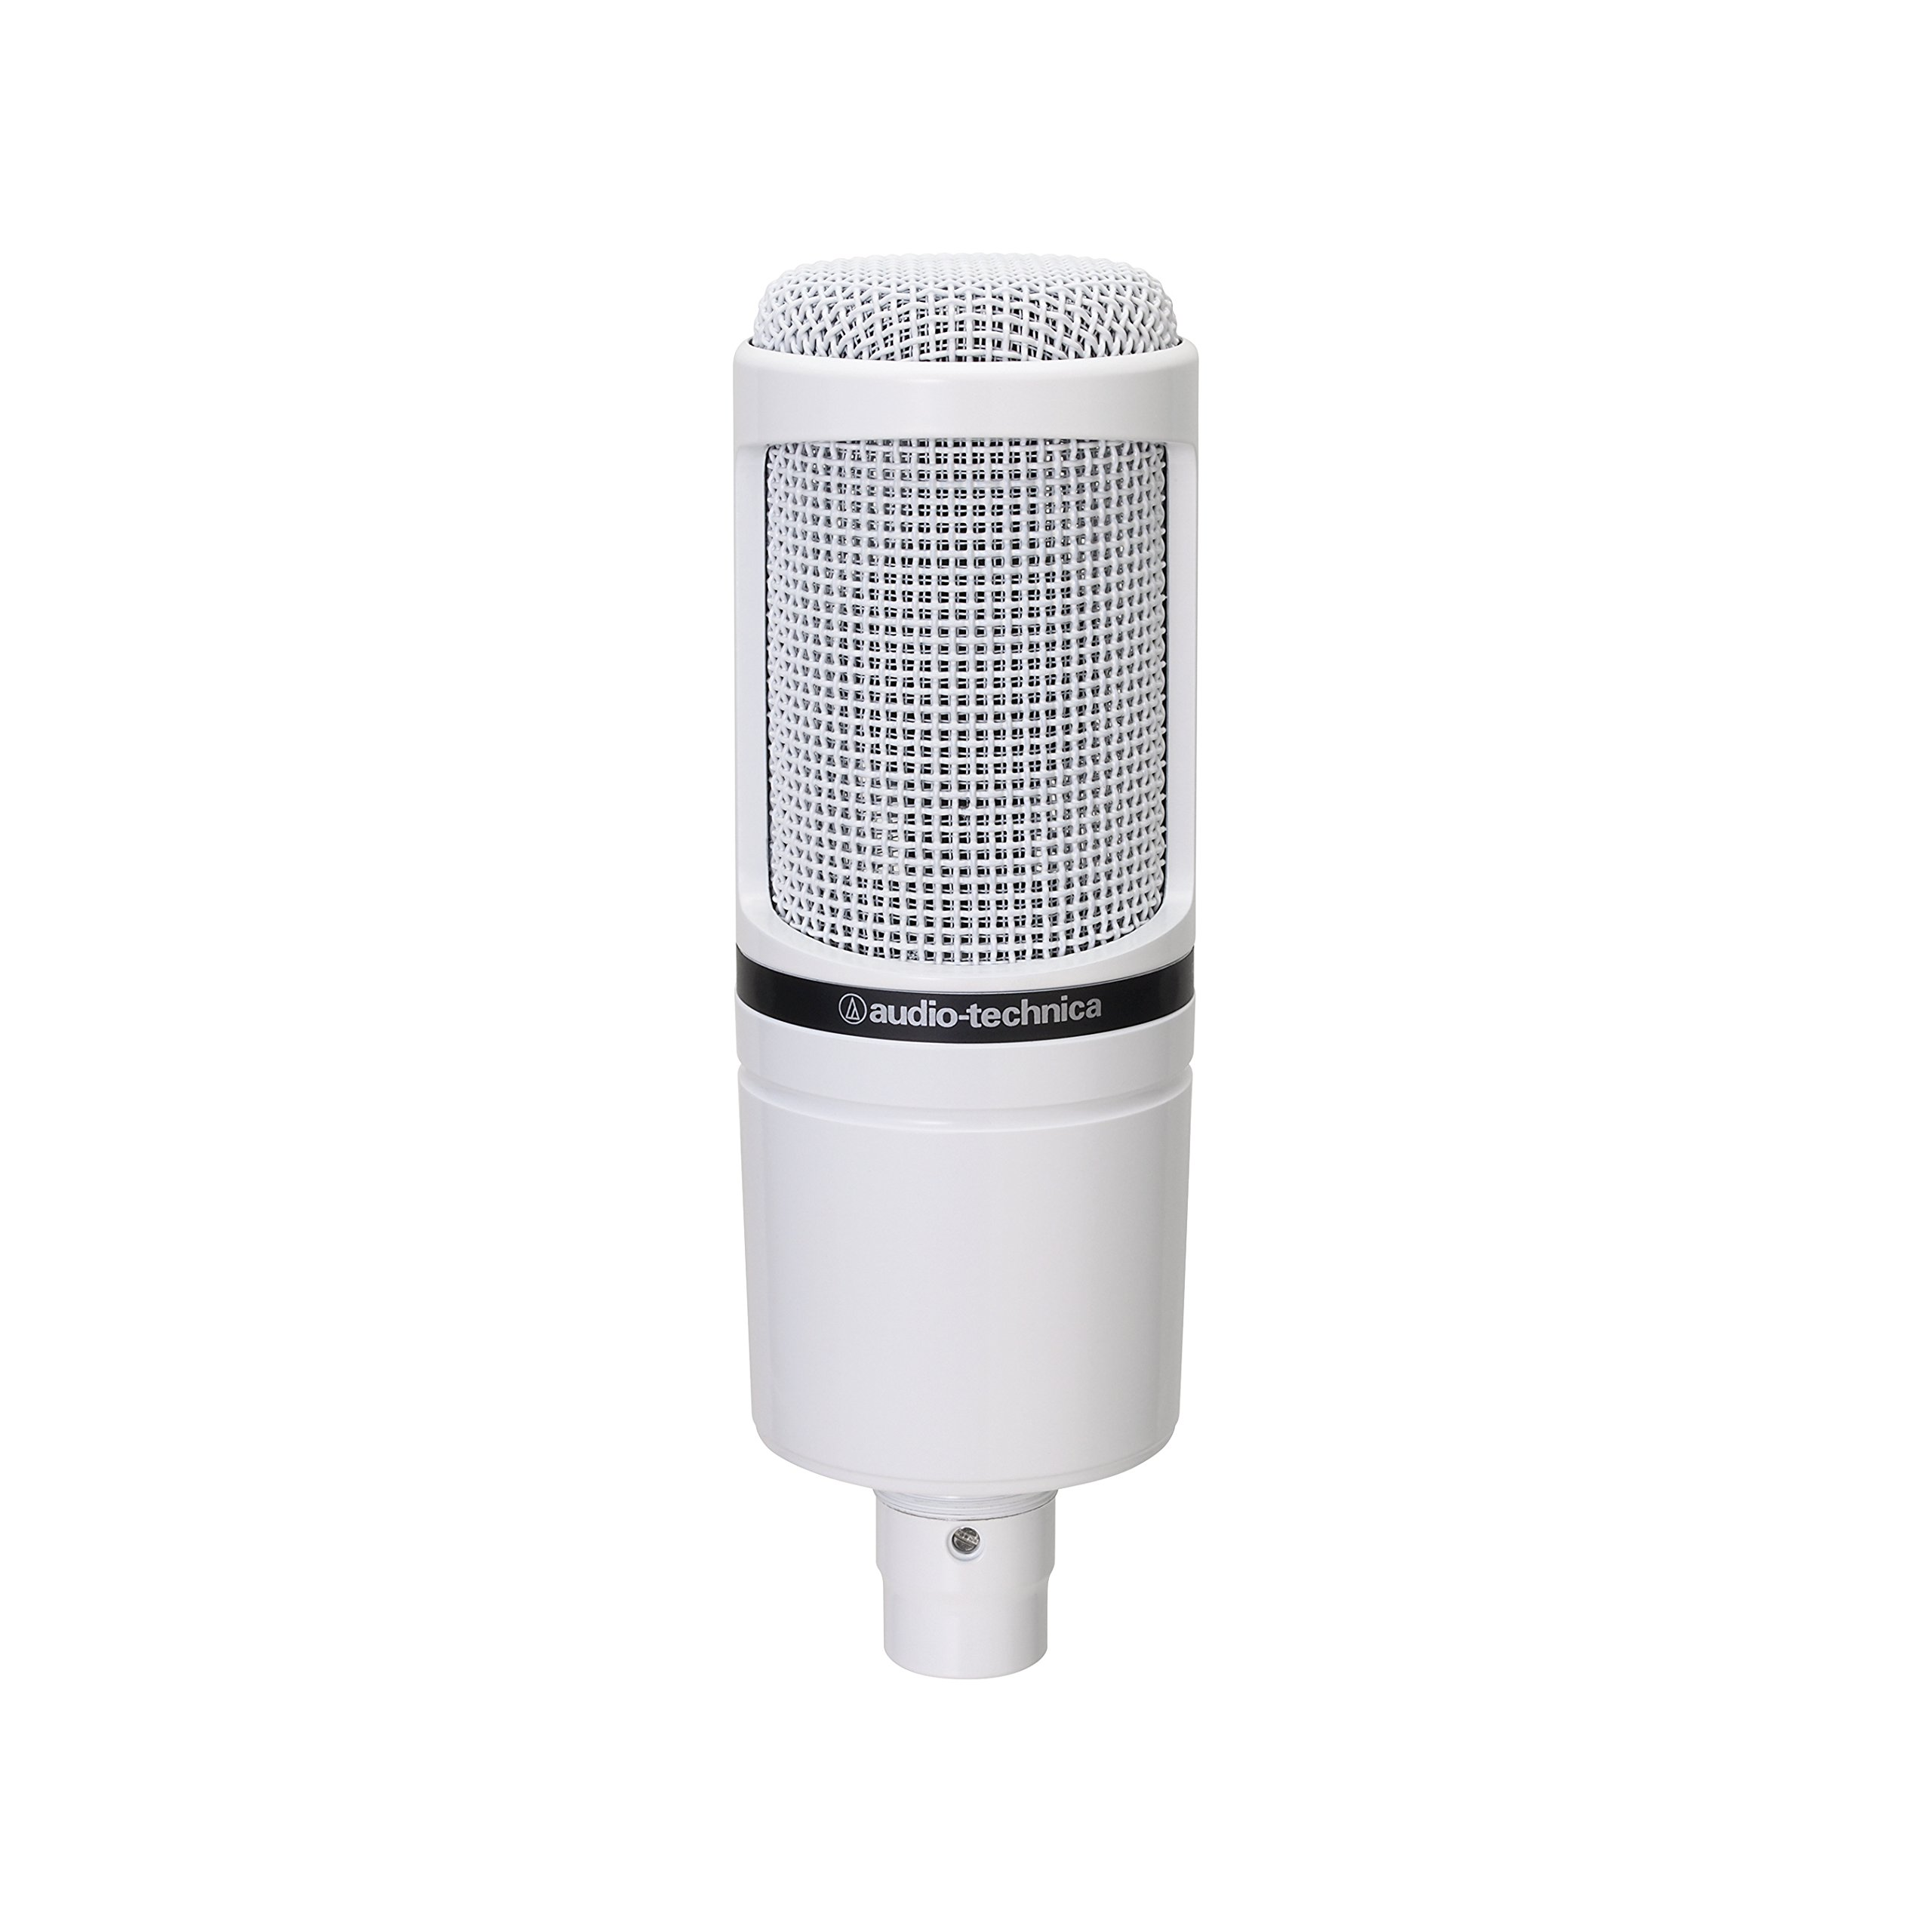 Audio-Technica AT2020 Cardioid Condenser Studio Microphone, White by Audio-Technica (Image #2)